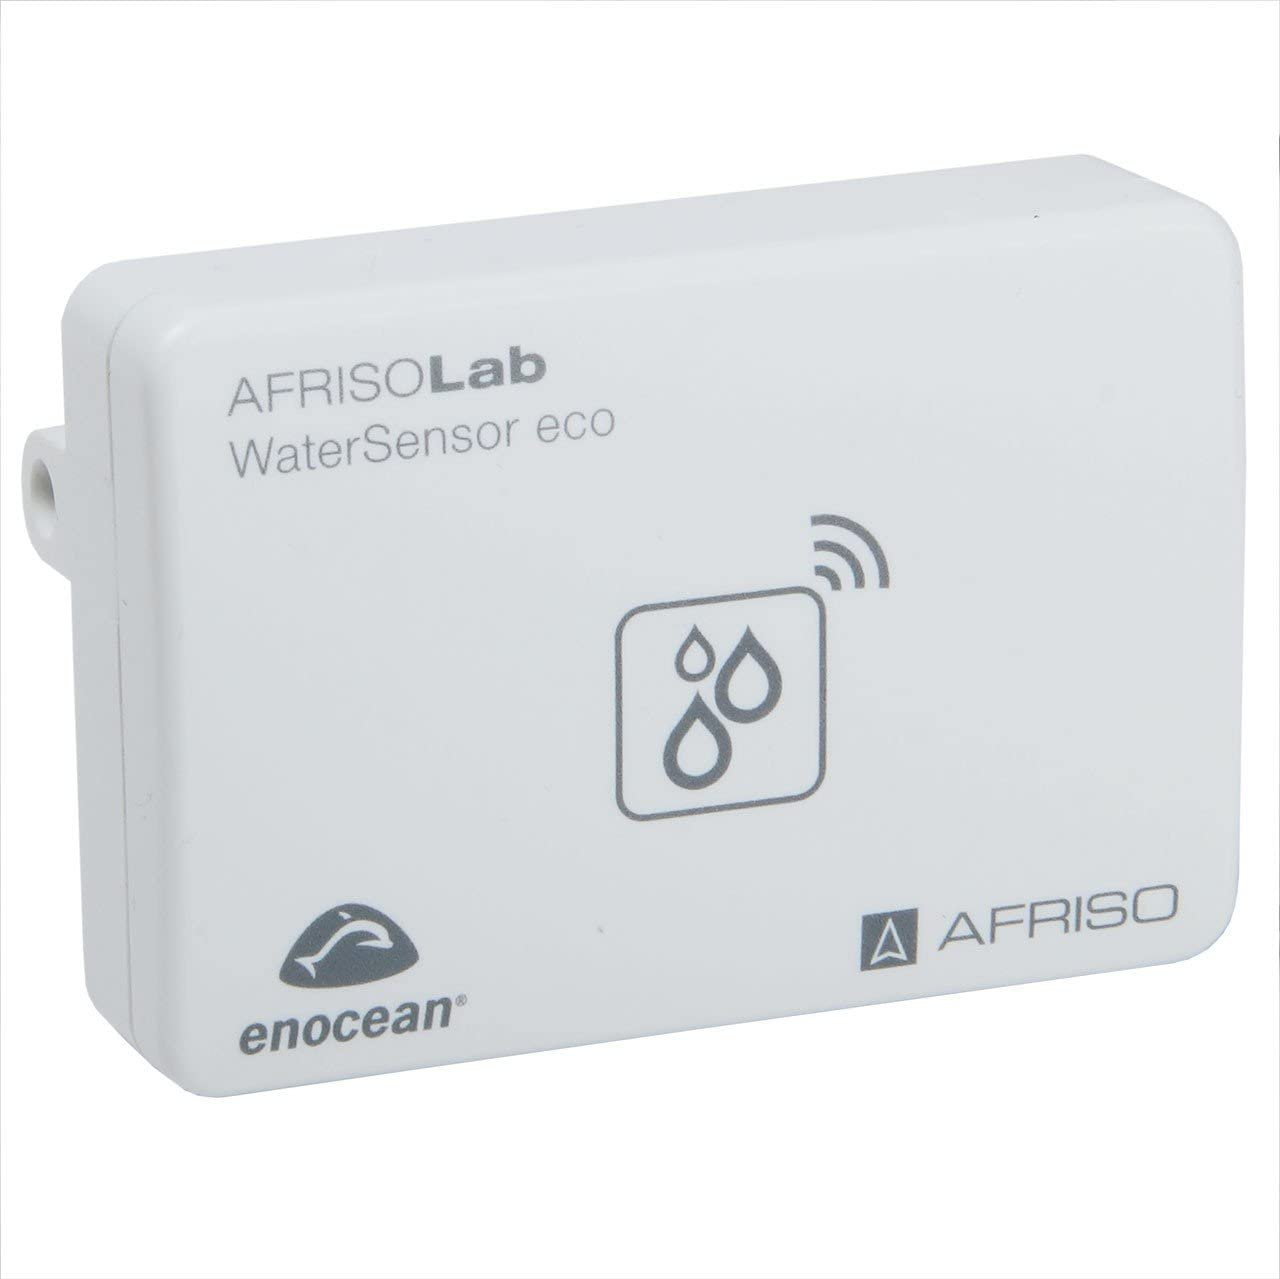 Afriso Smart Home Water Sensor eco